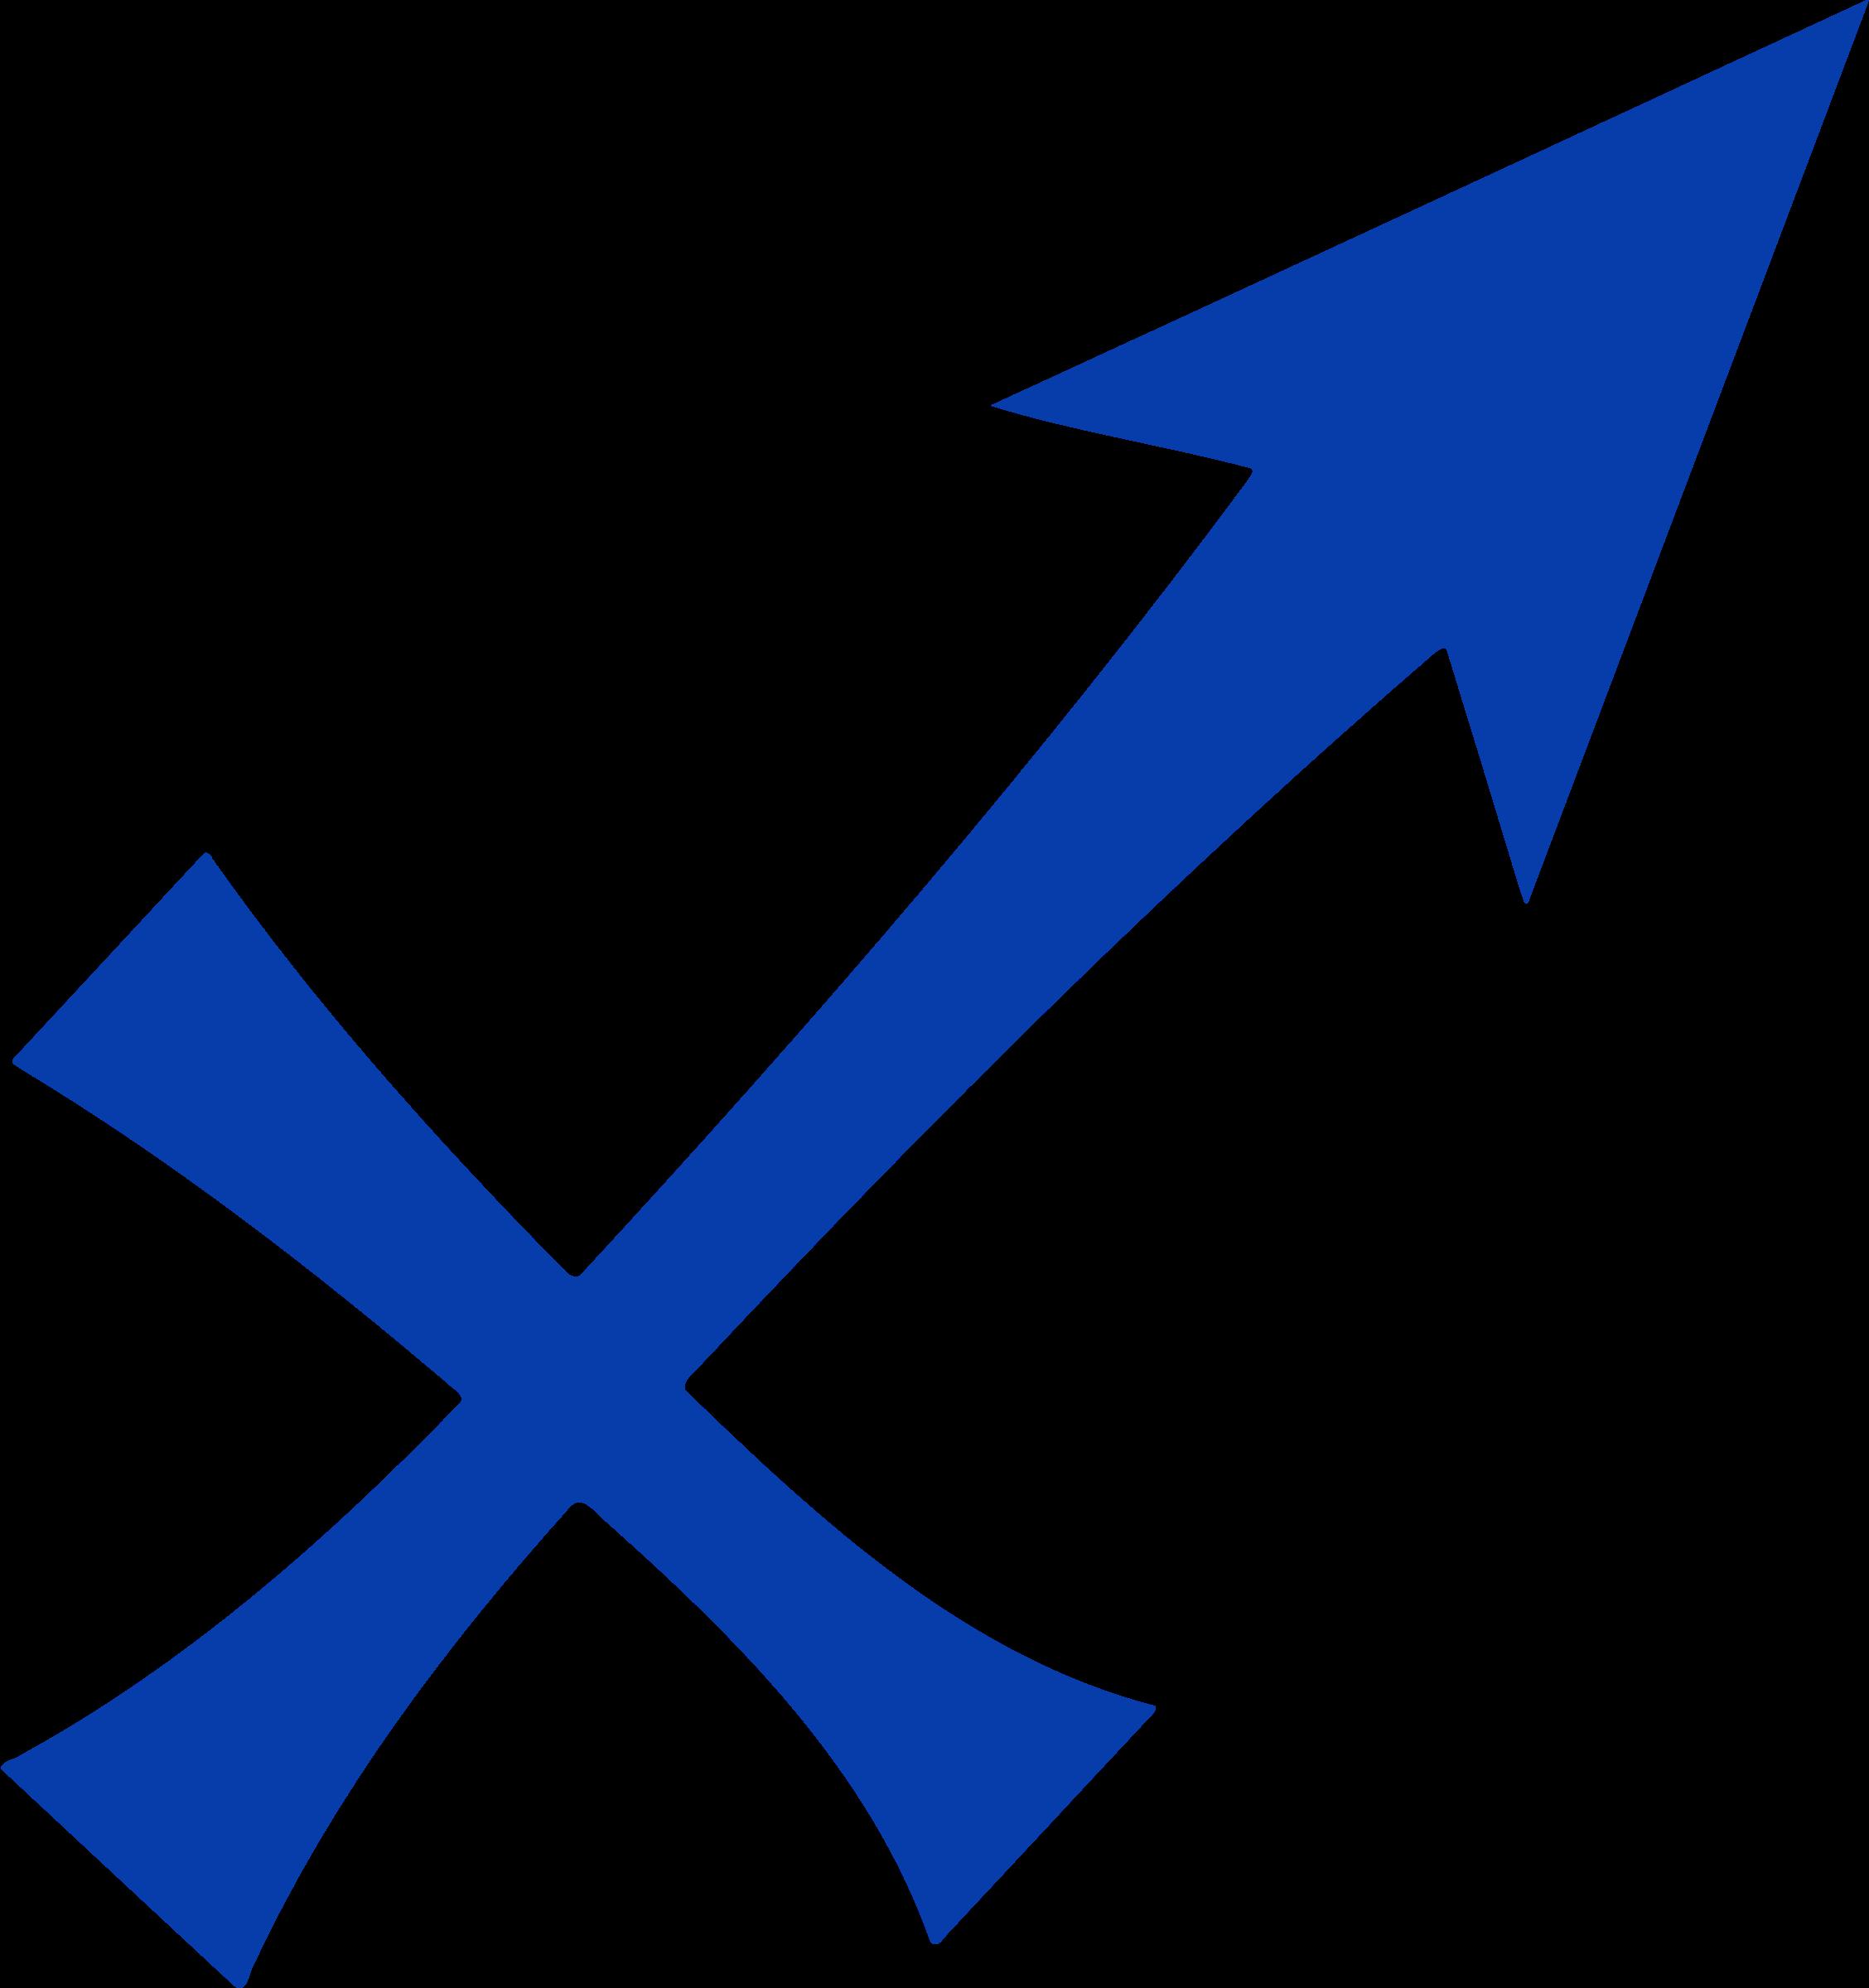 Clipart woman sagittarius. Logos symbol